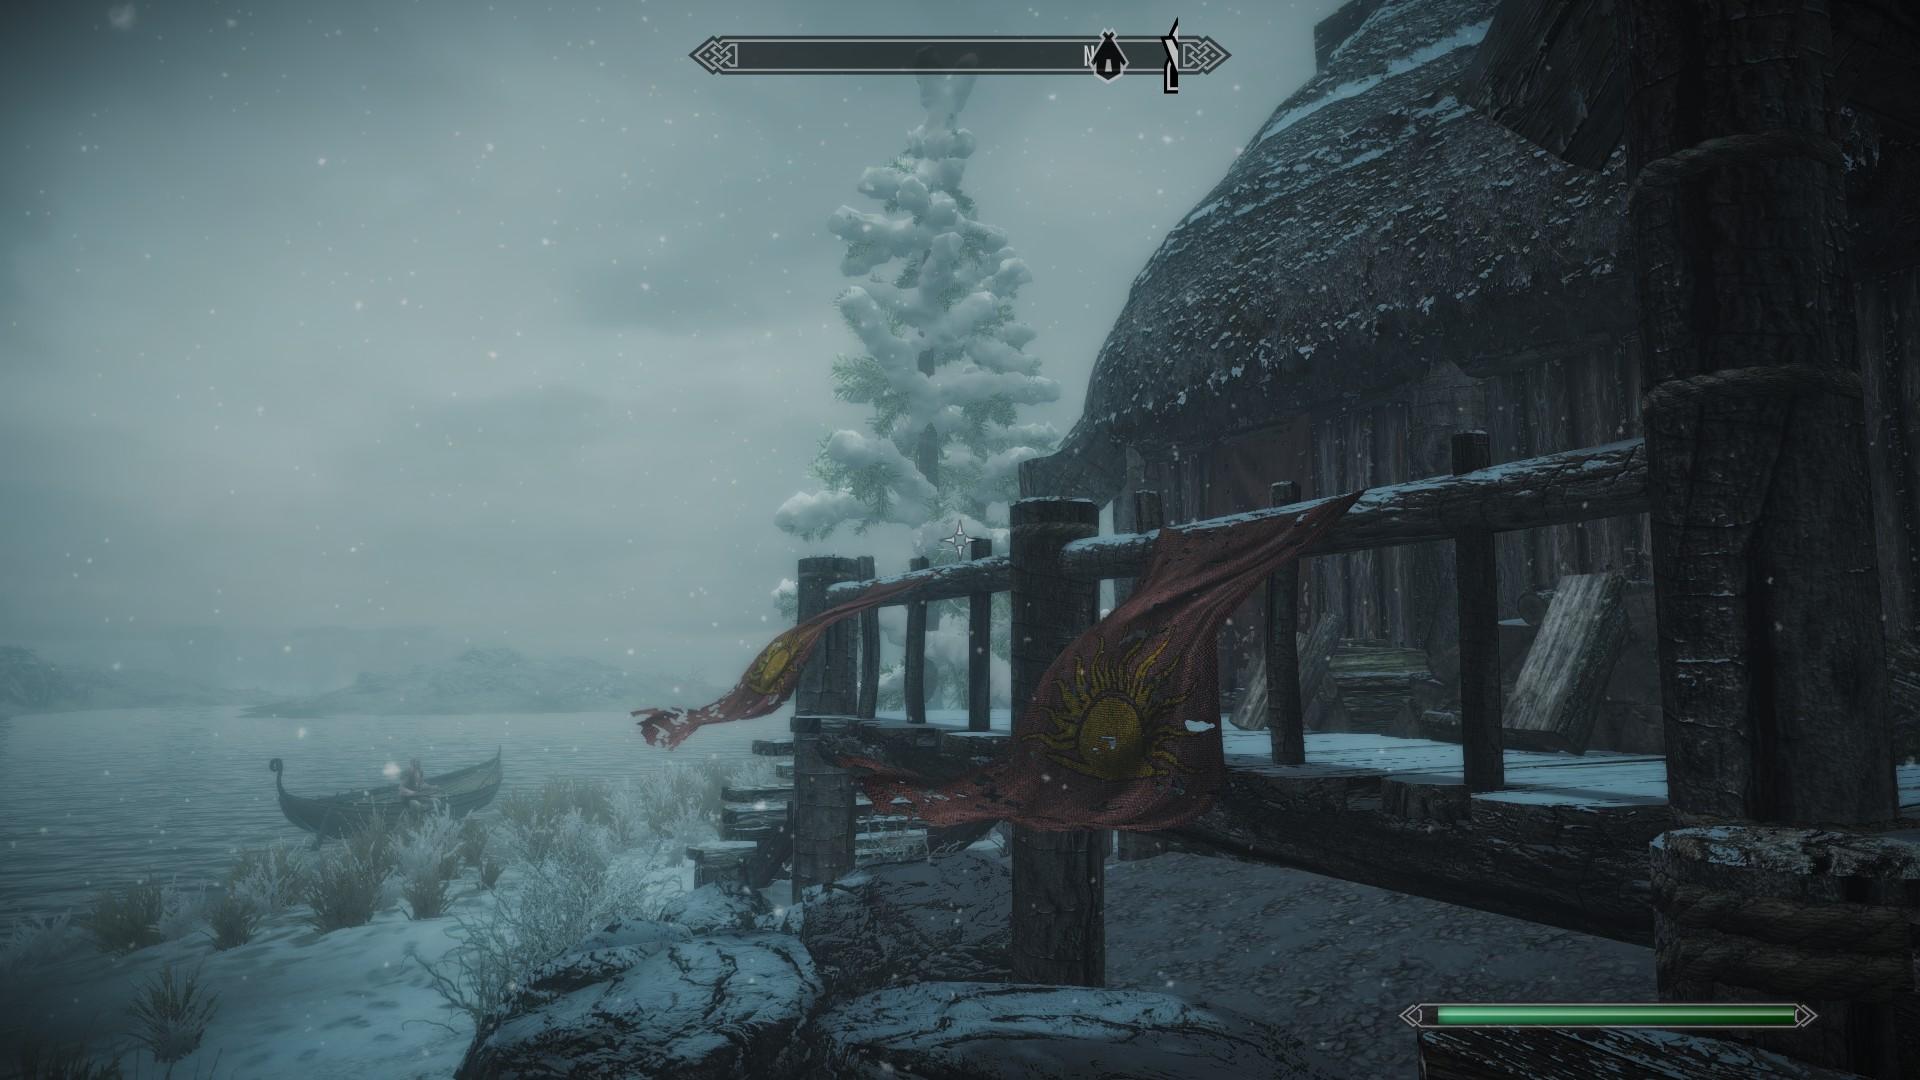 20180212105852_1.jpg - Elder Scrolls 5: Skyrim, the